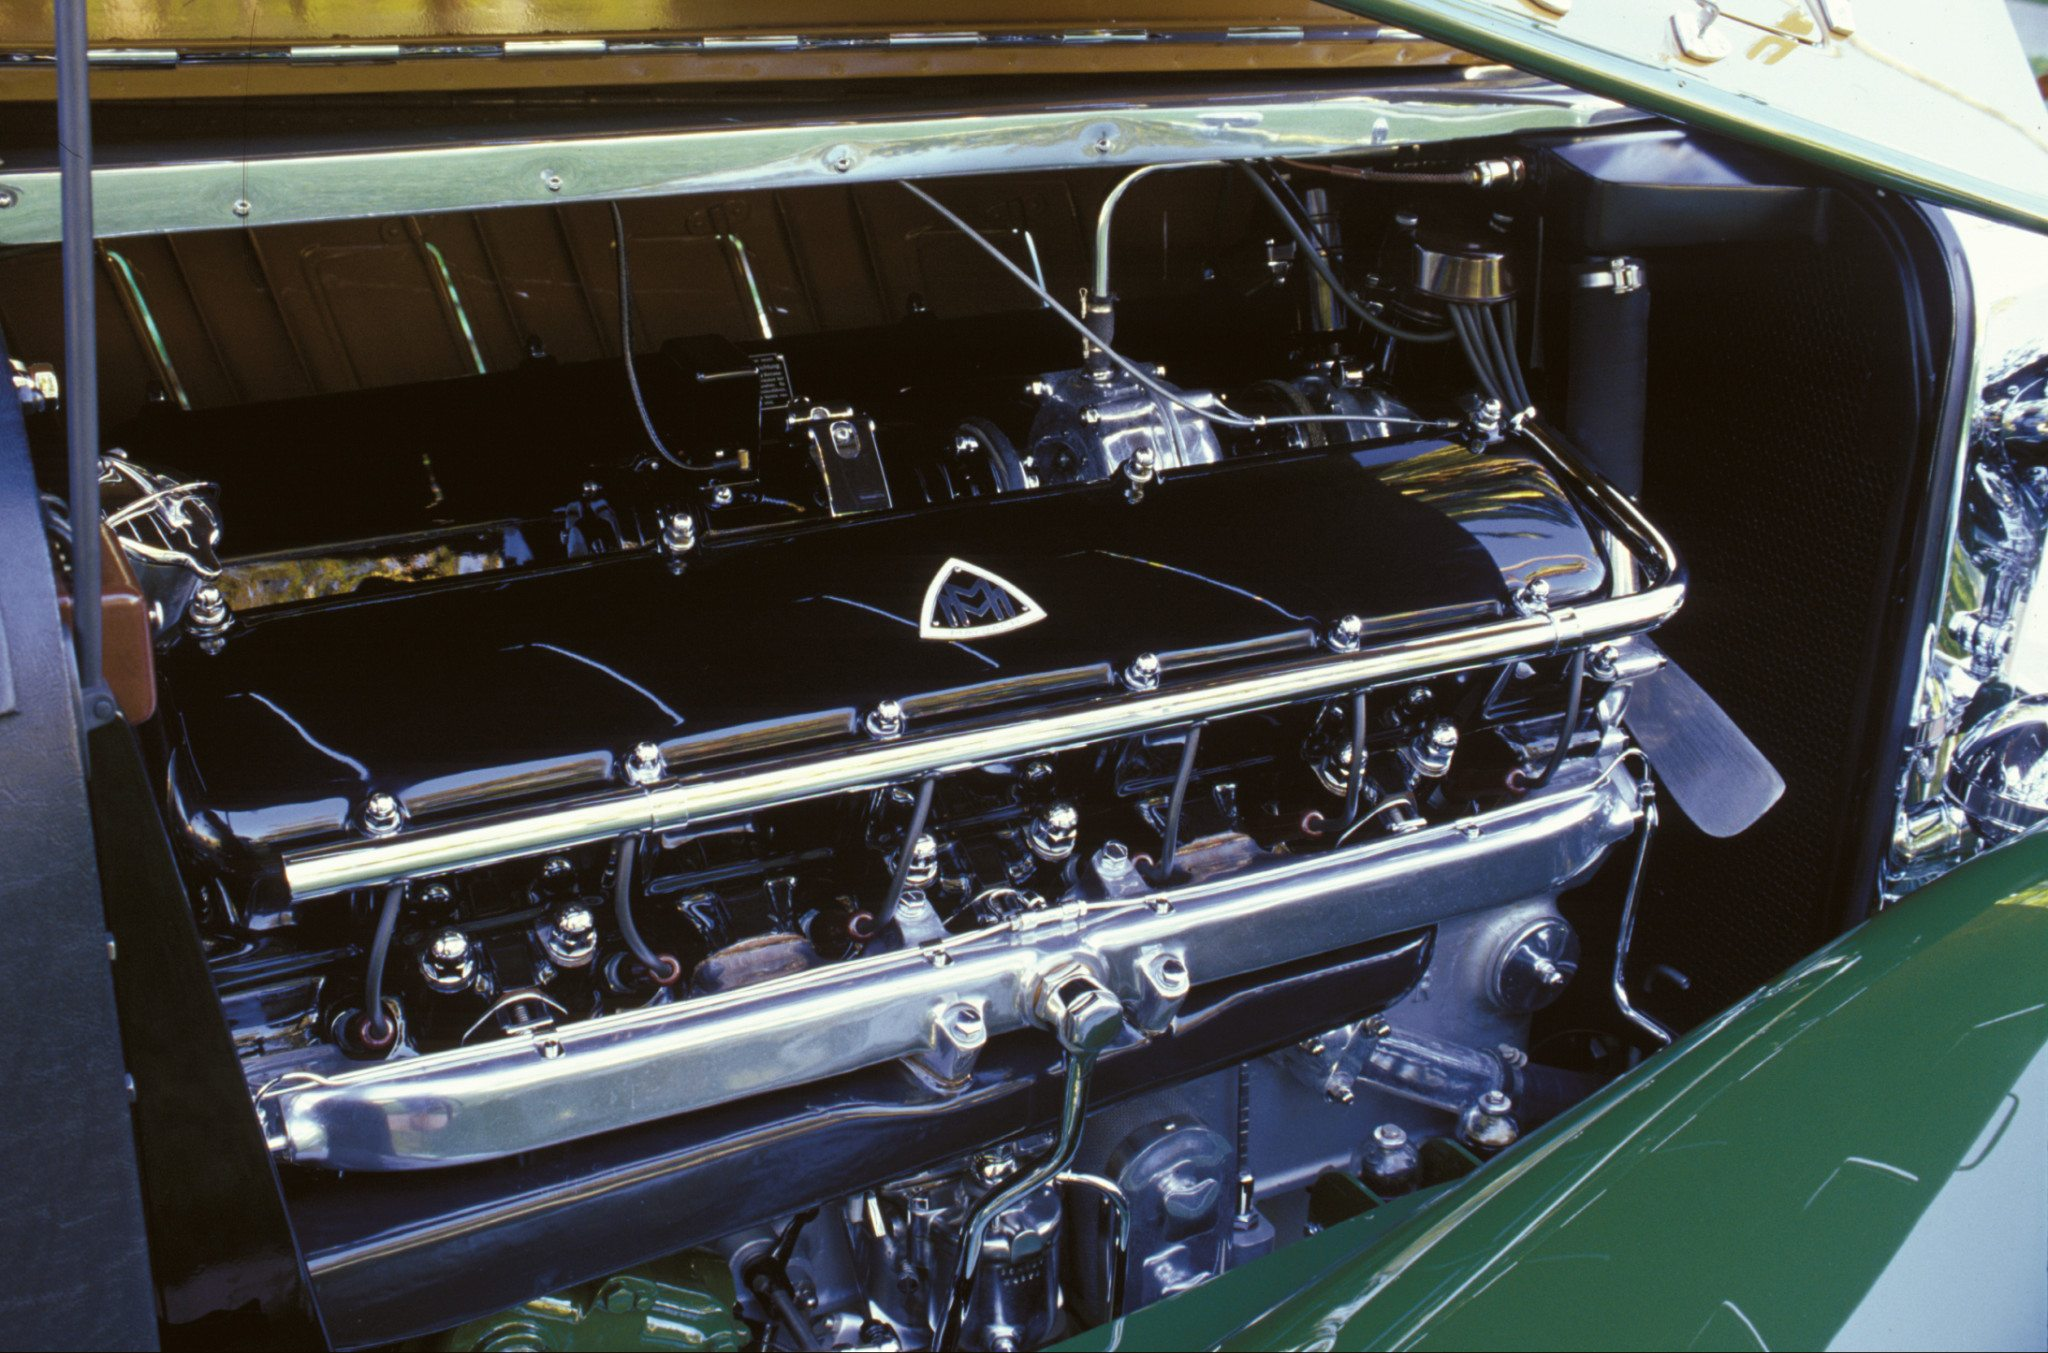 Maybach Zeppelin Ds V Engine on 1940 Cadillac V16 Engine